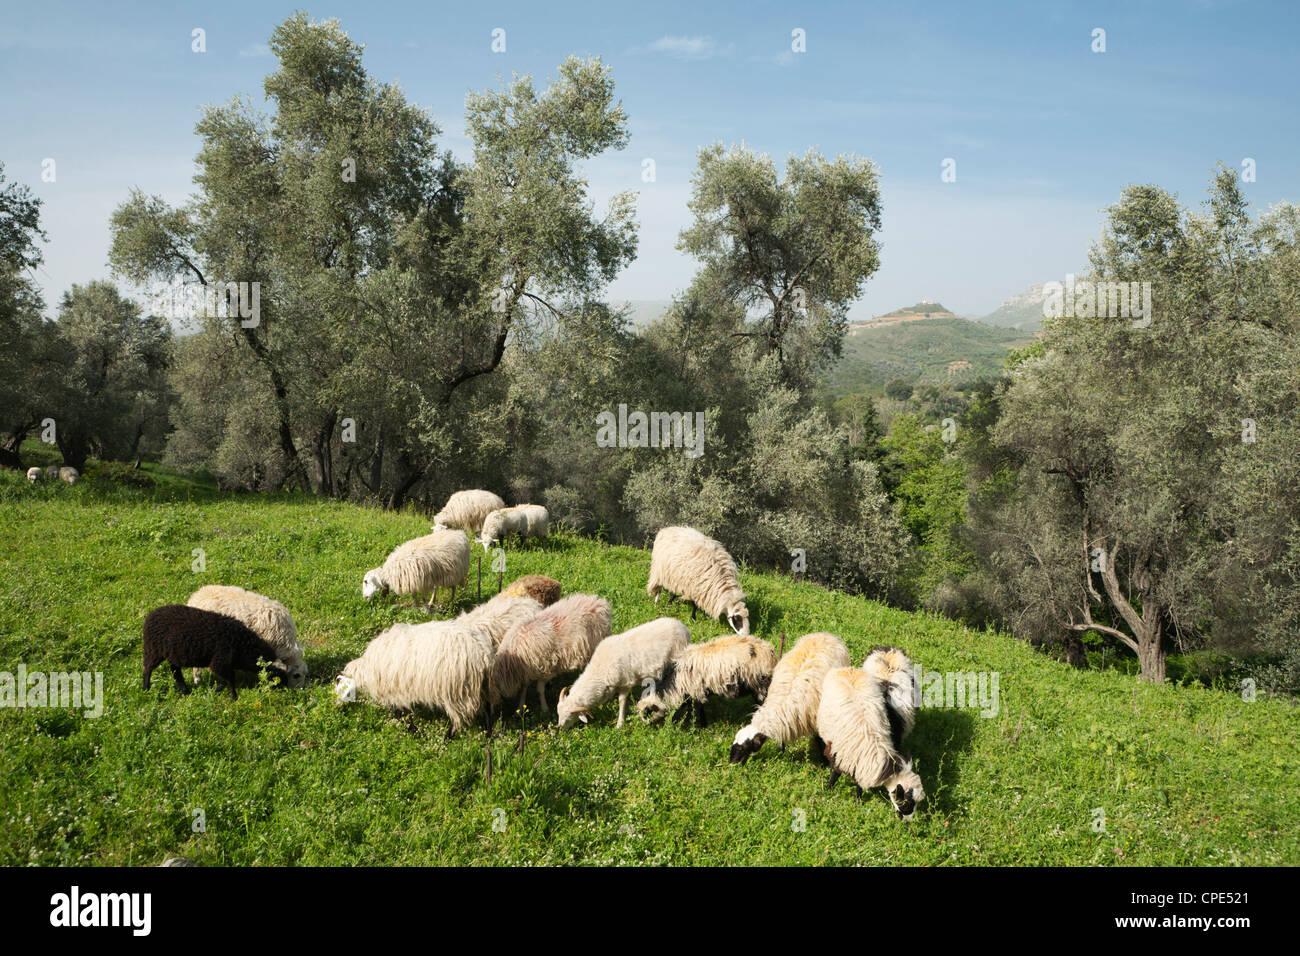 Sheep in olive grove, Patsos, Rethimnon (Rethymno) region, Crete, Greek Islands, Greece, Europe - Stock Image